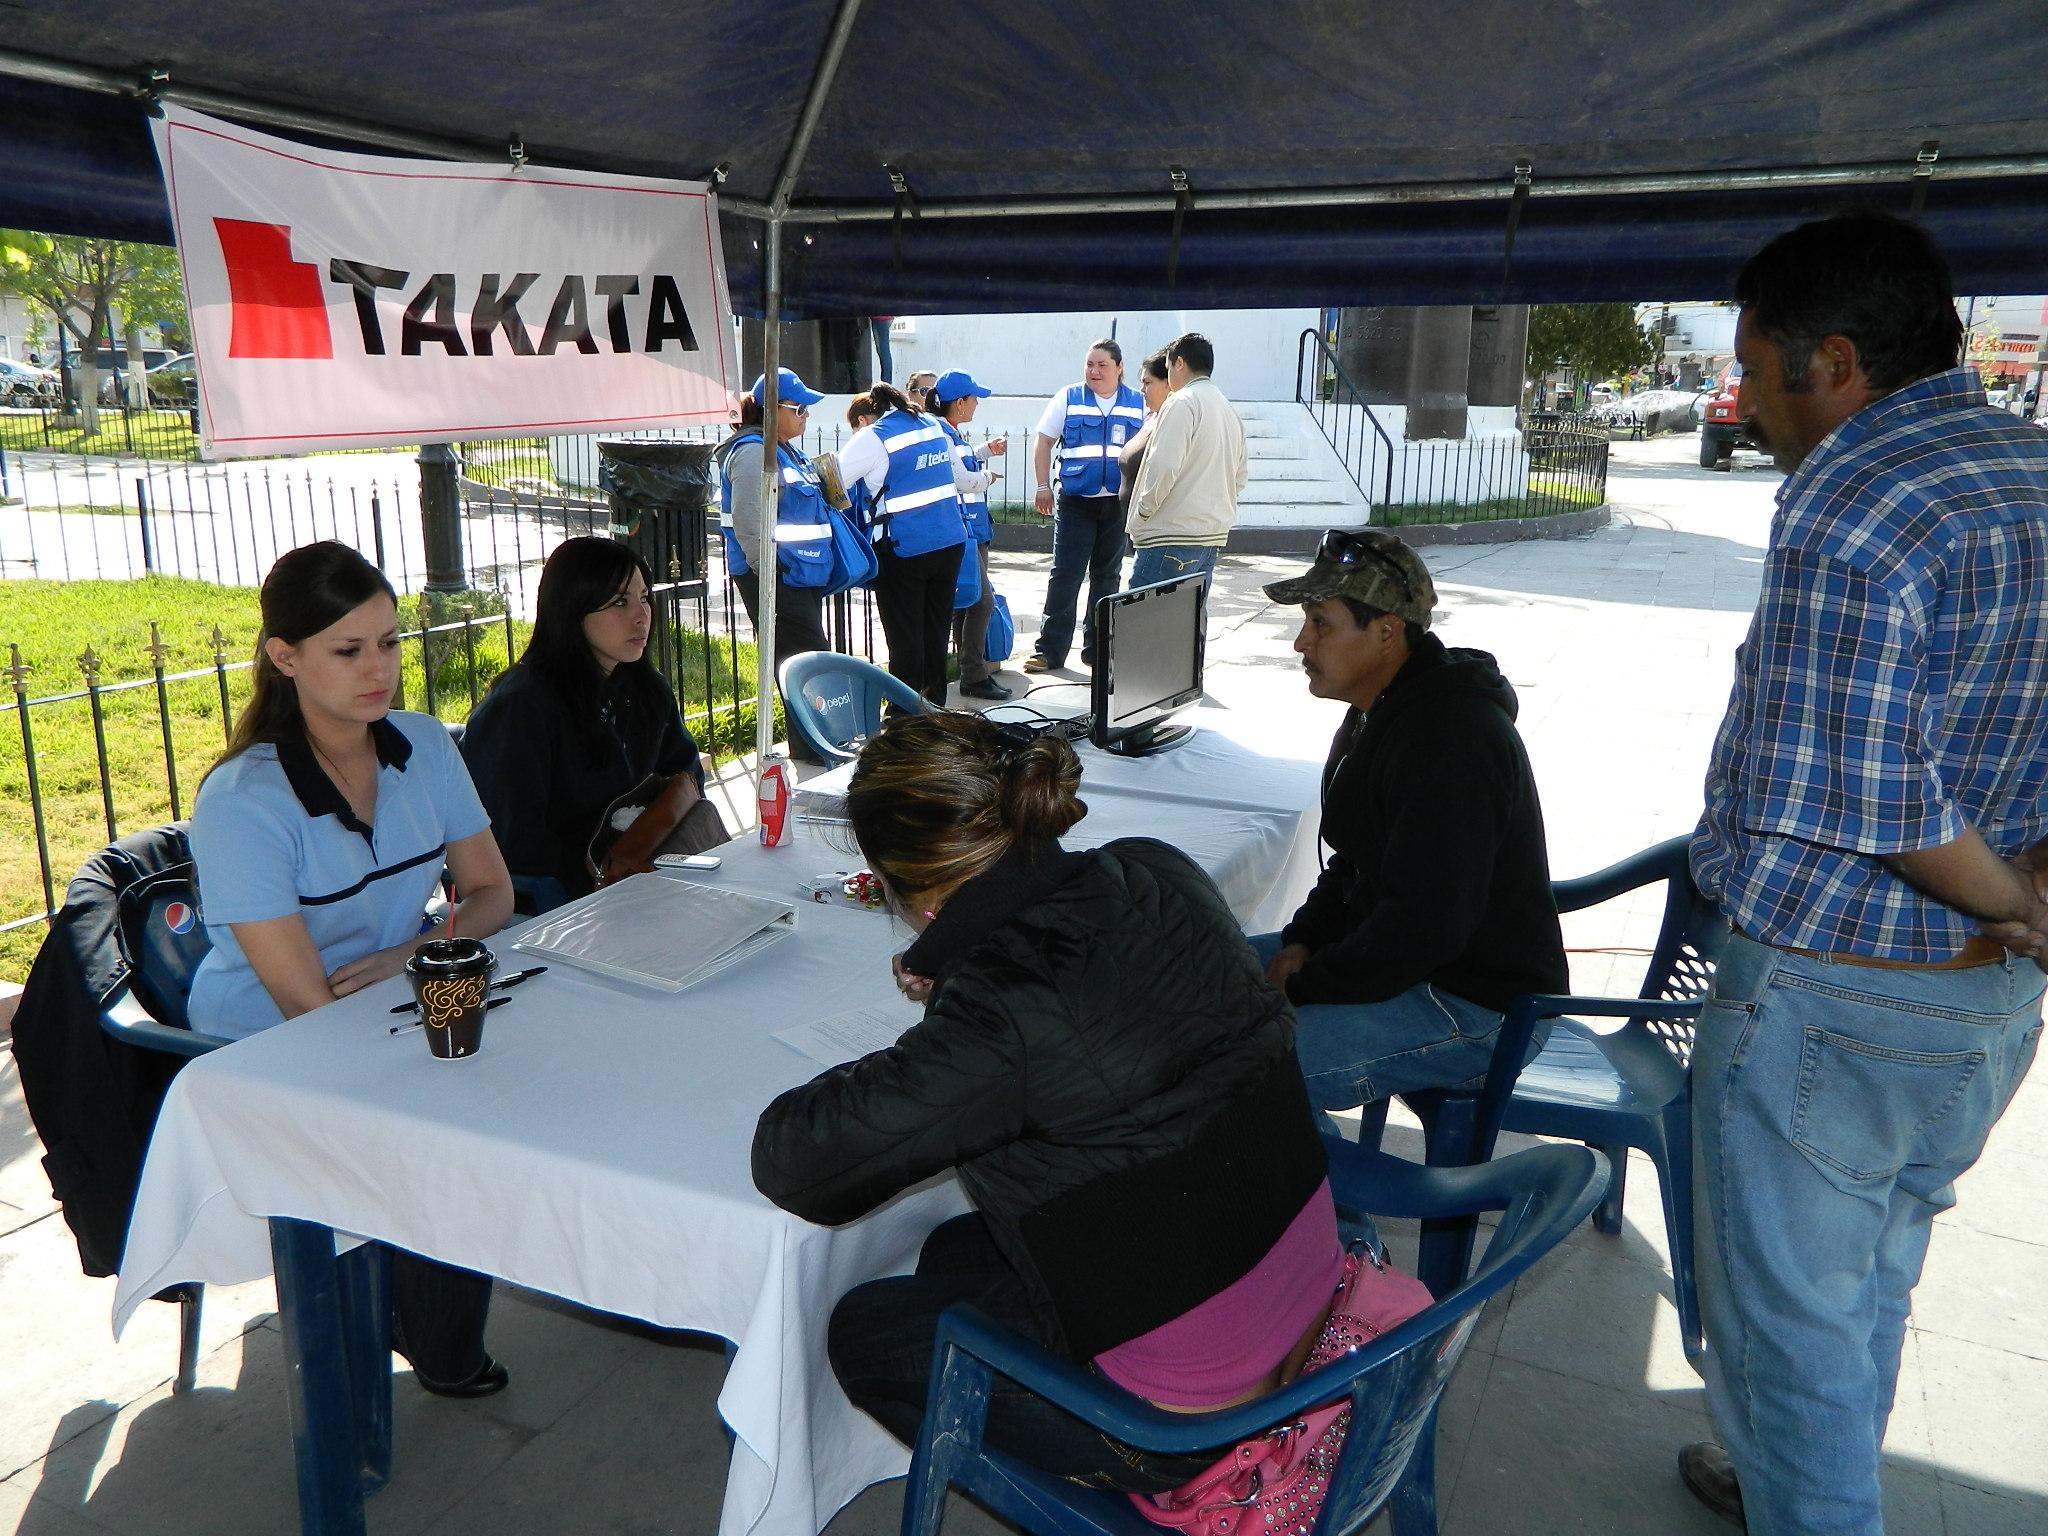 Takata se declara en bancarrota tras escándalo por bolsas de aire defectuosas